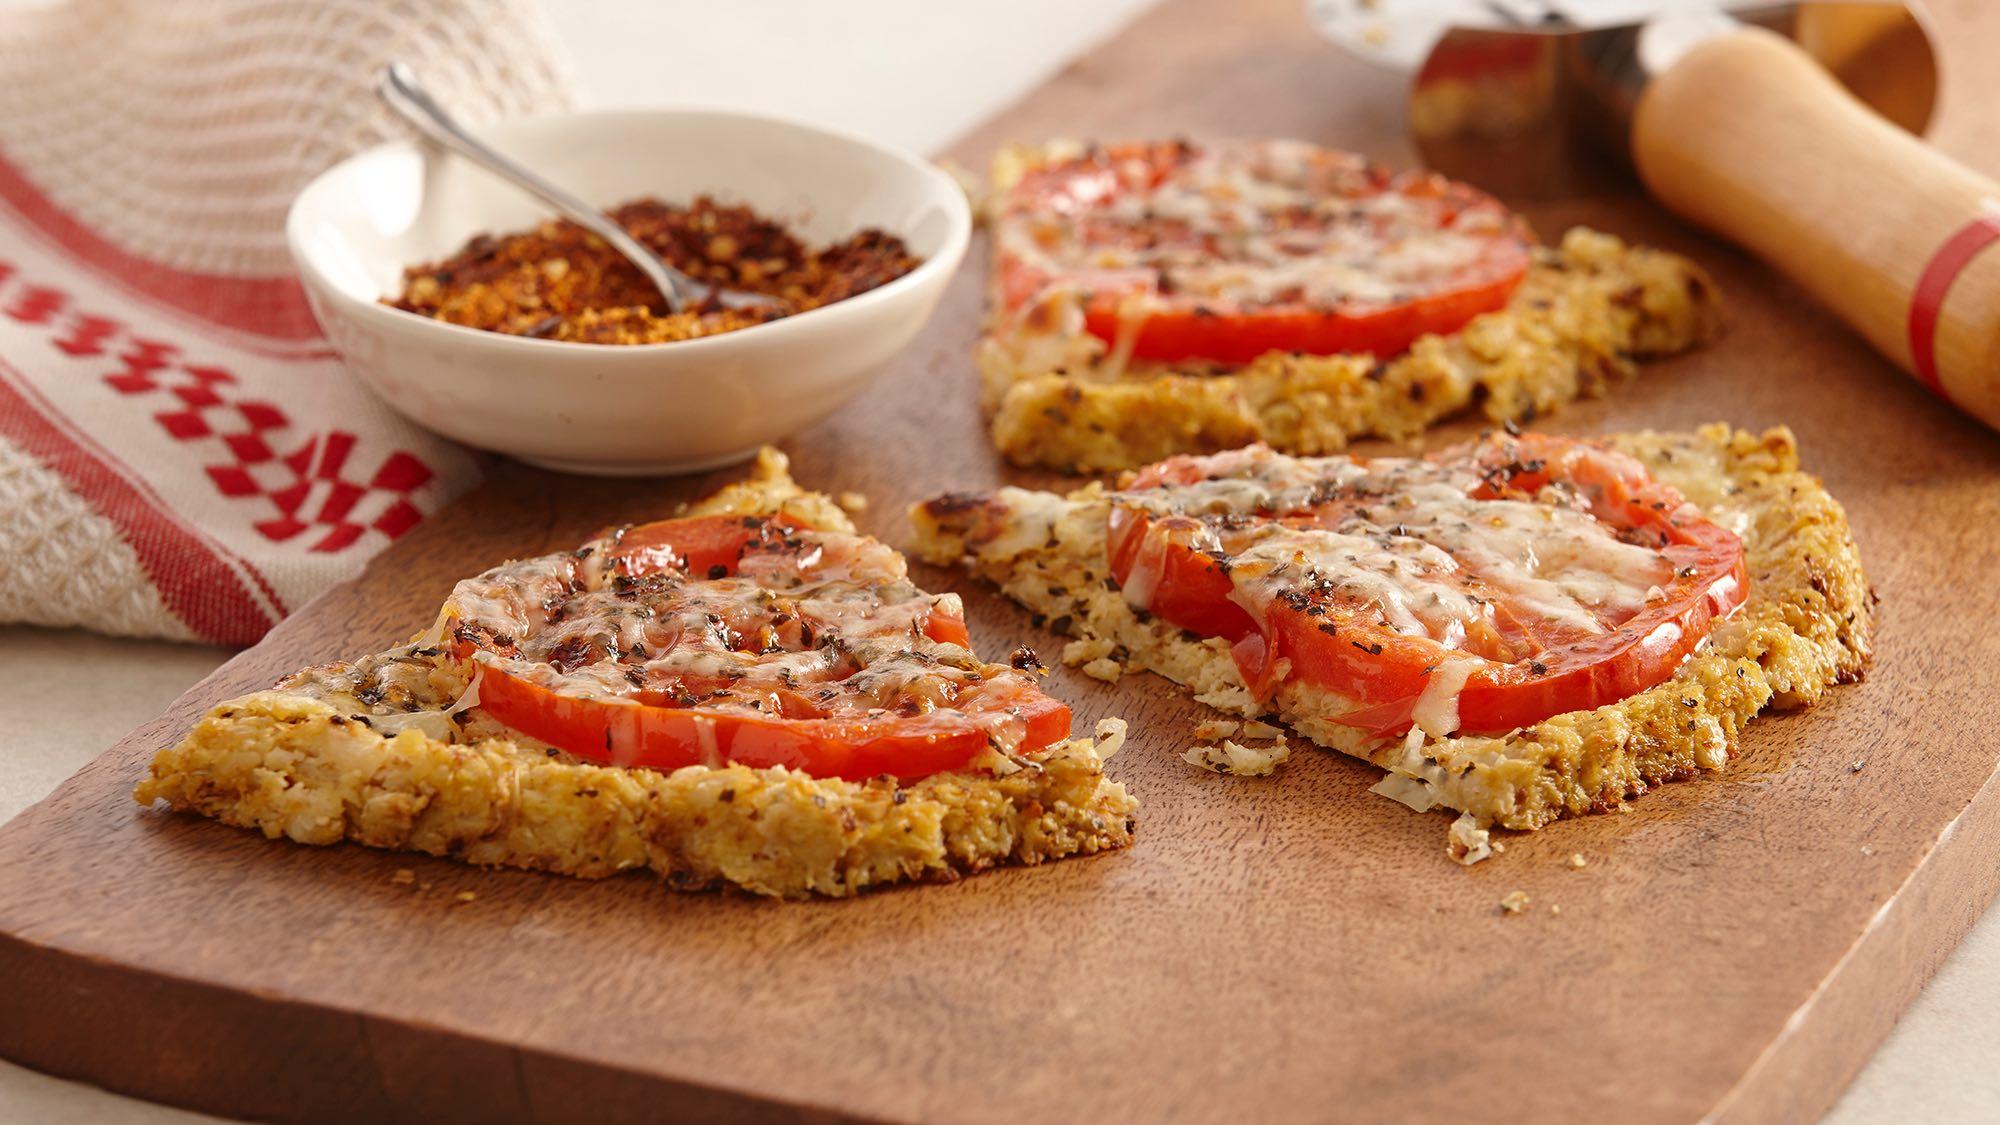 McCormick Gluten-free Fresh Tomato Pizza With Cauliflower Crust